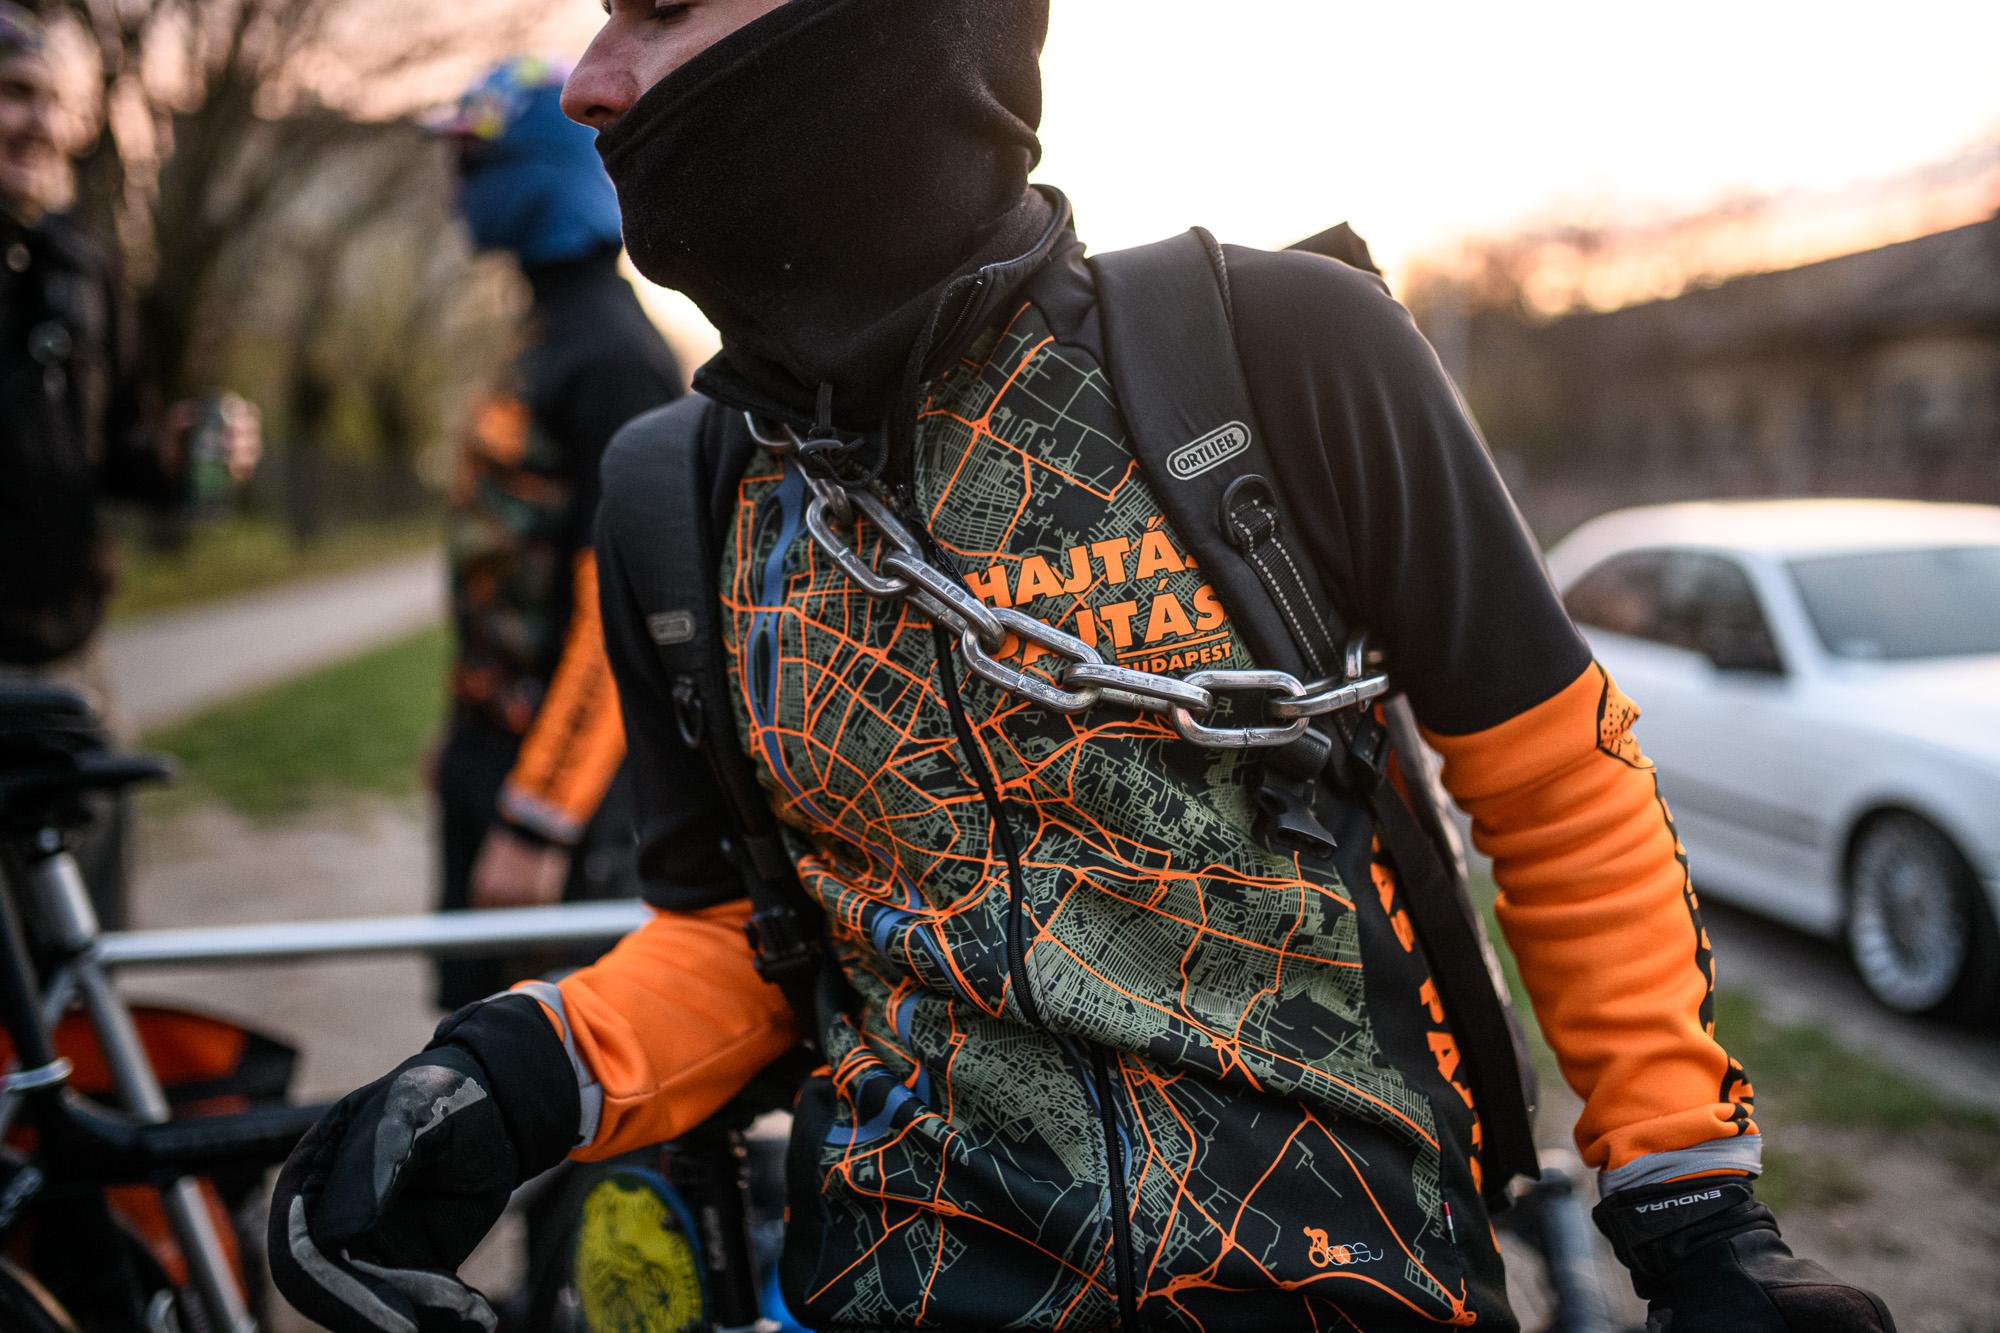 Budapest Bike Maffia, Vitamin Kommandó